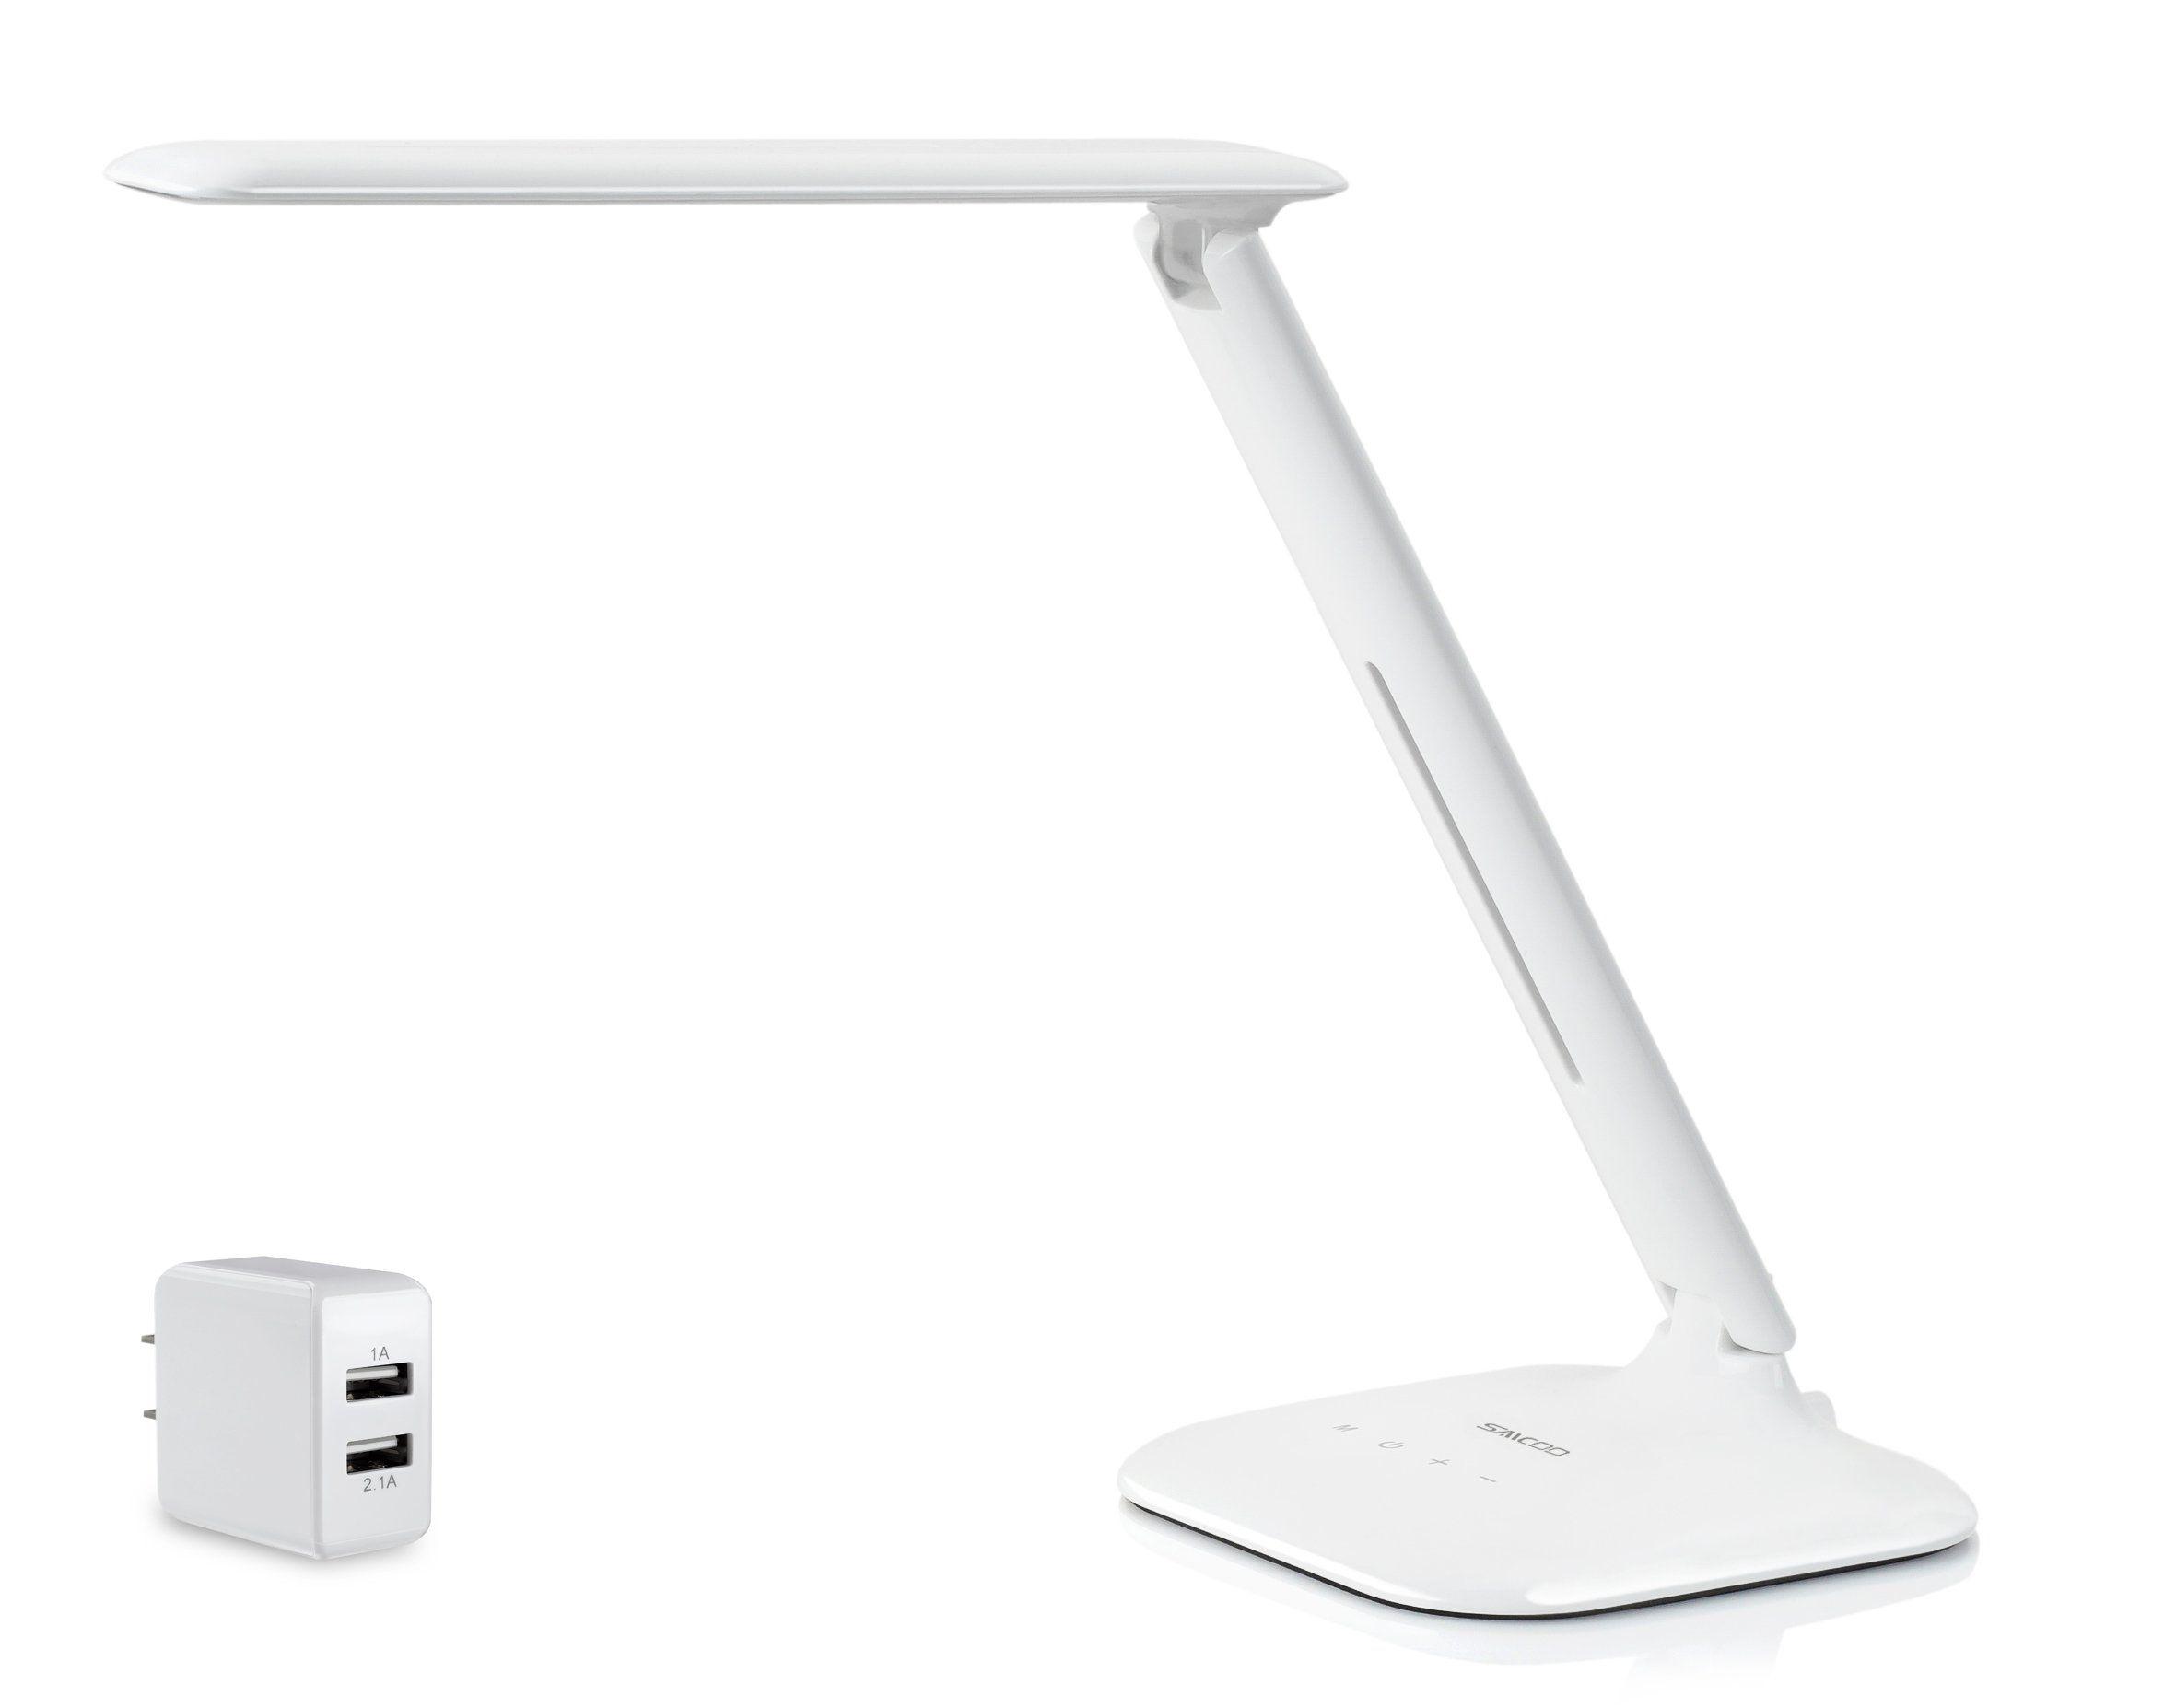 white itm book tablet desk lamp gooseneck holder stand adjustable light organizer